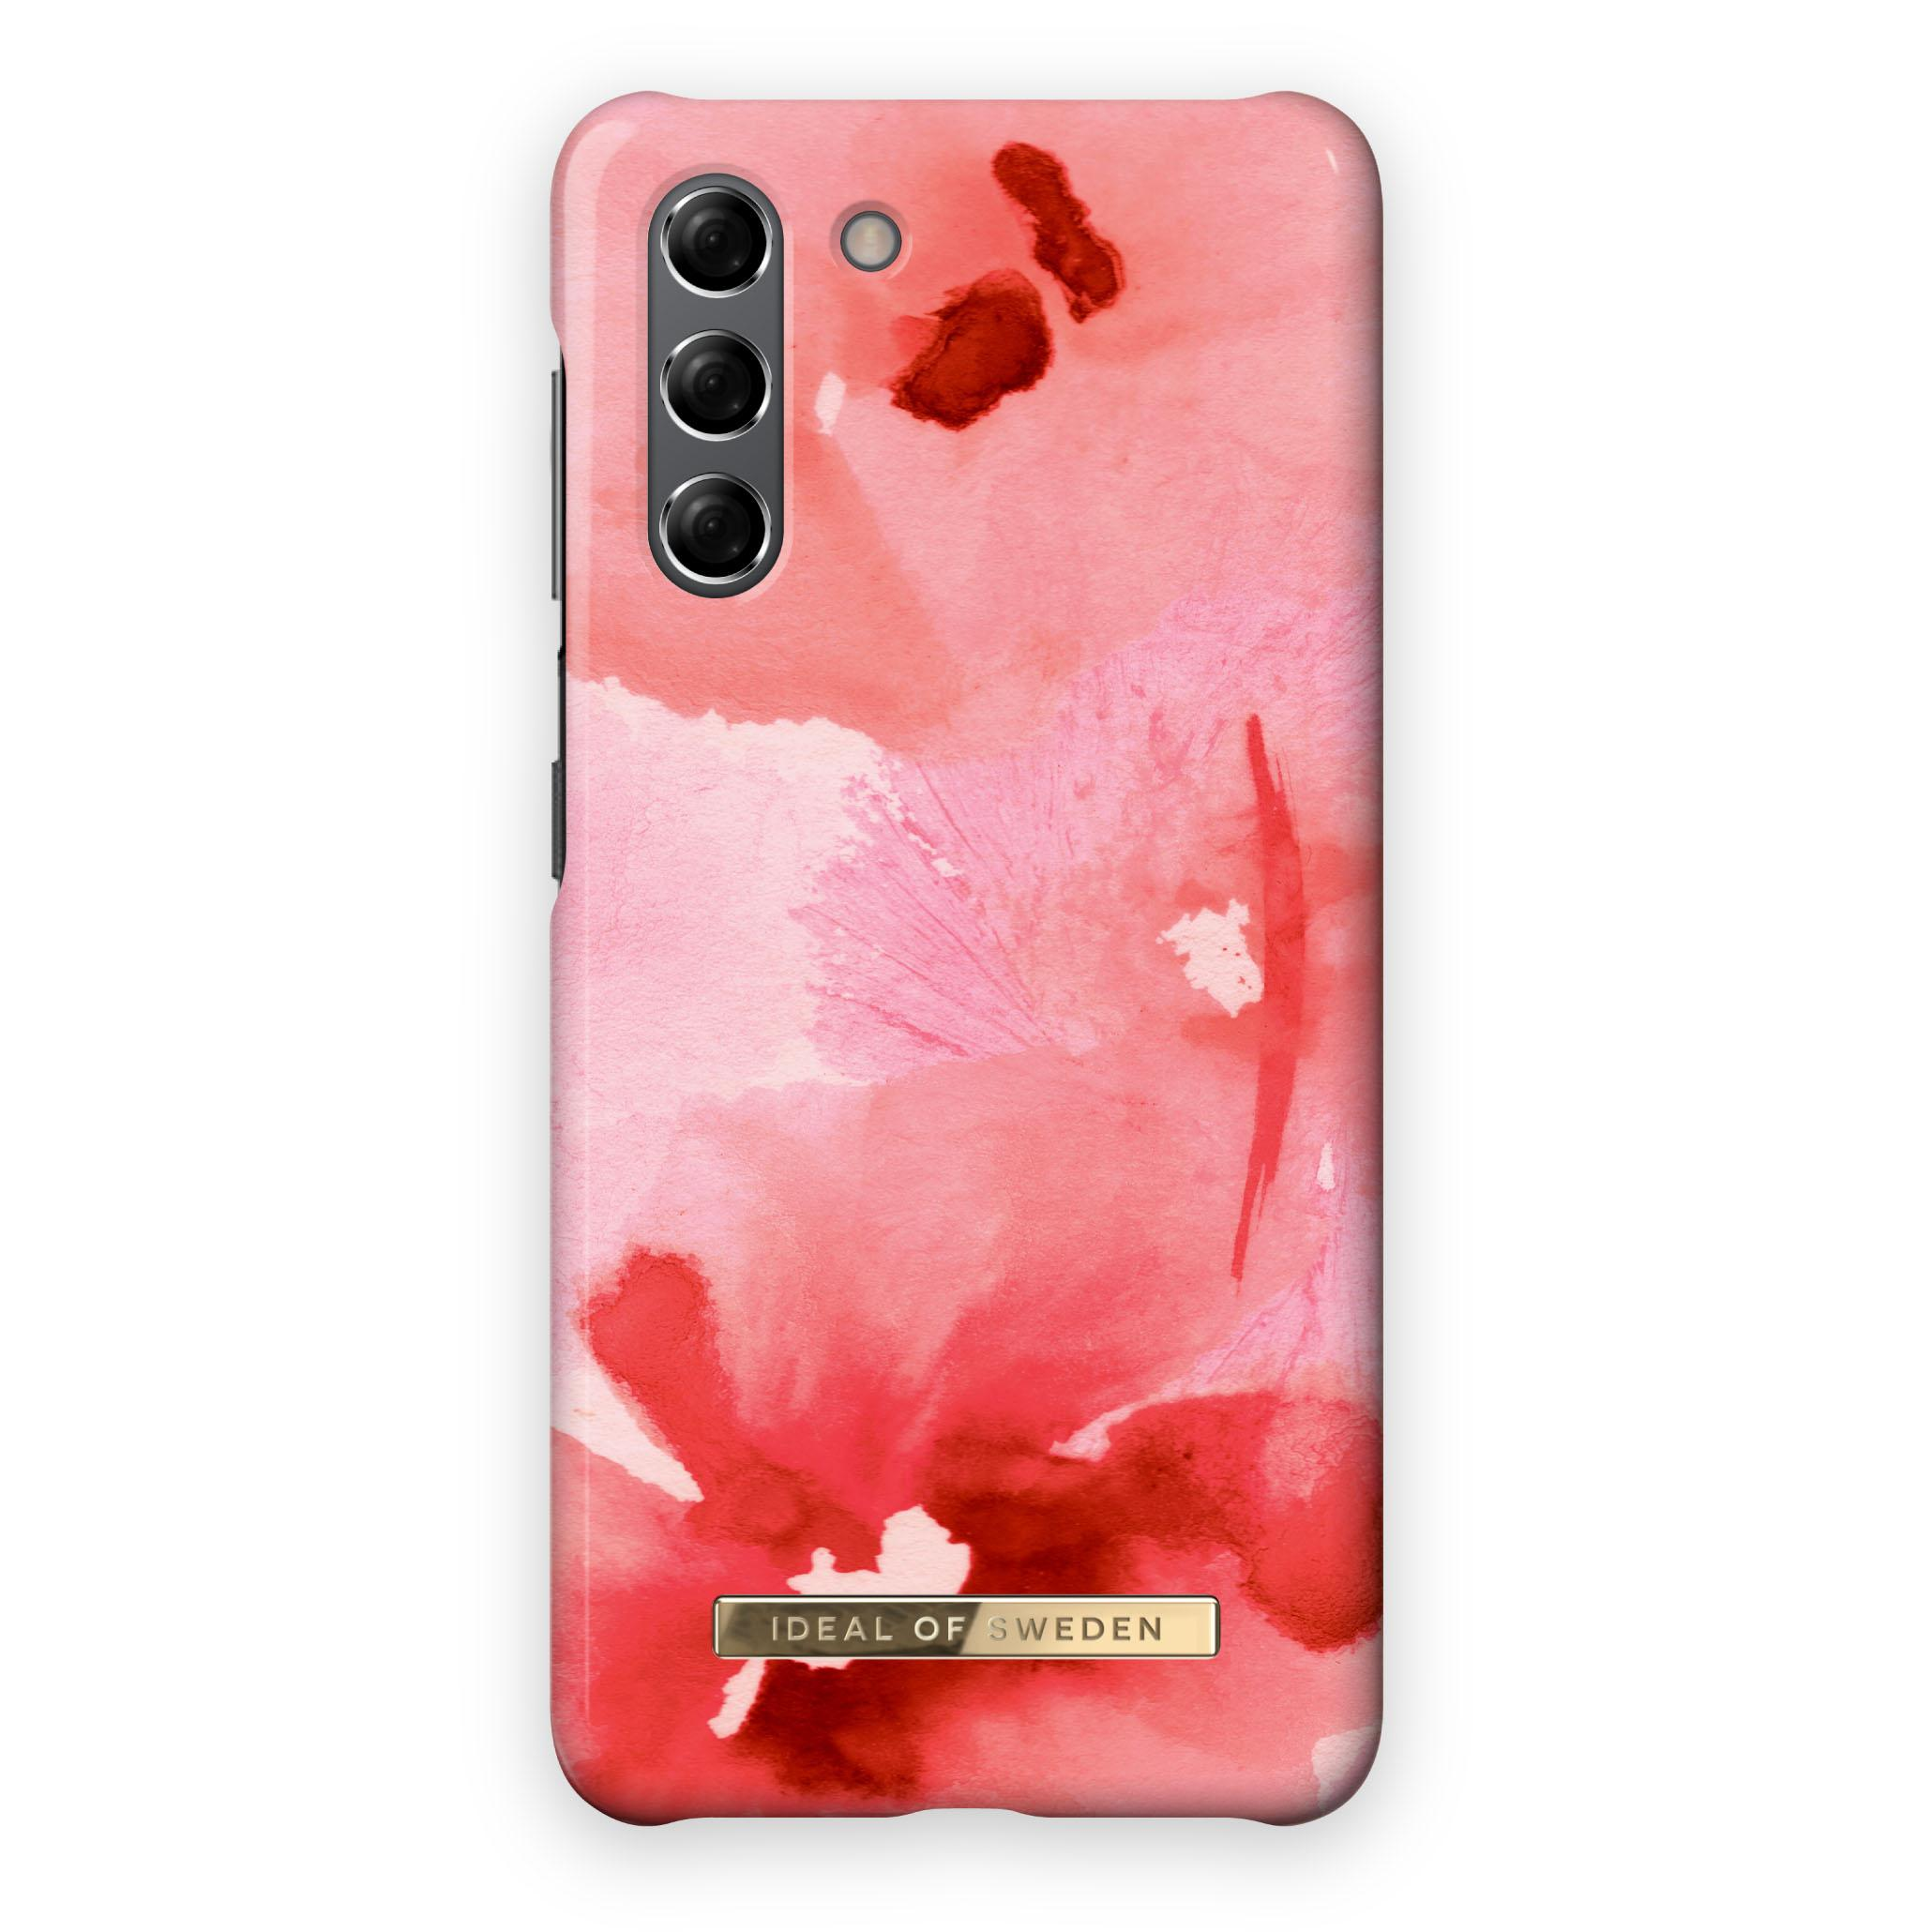 Fashion Case Galaxy S21 Coral Blush Floral